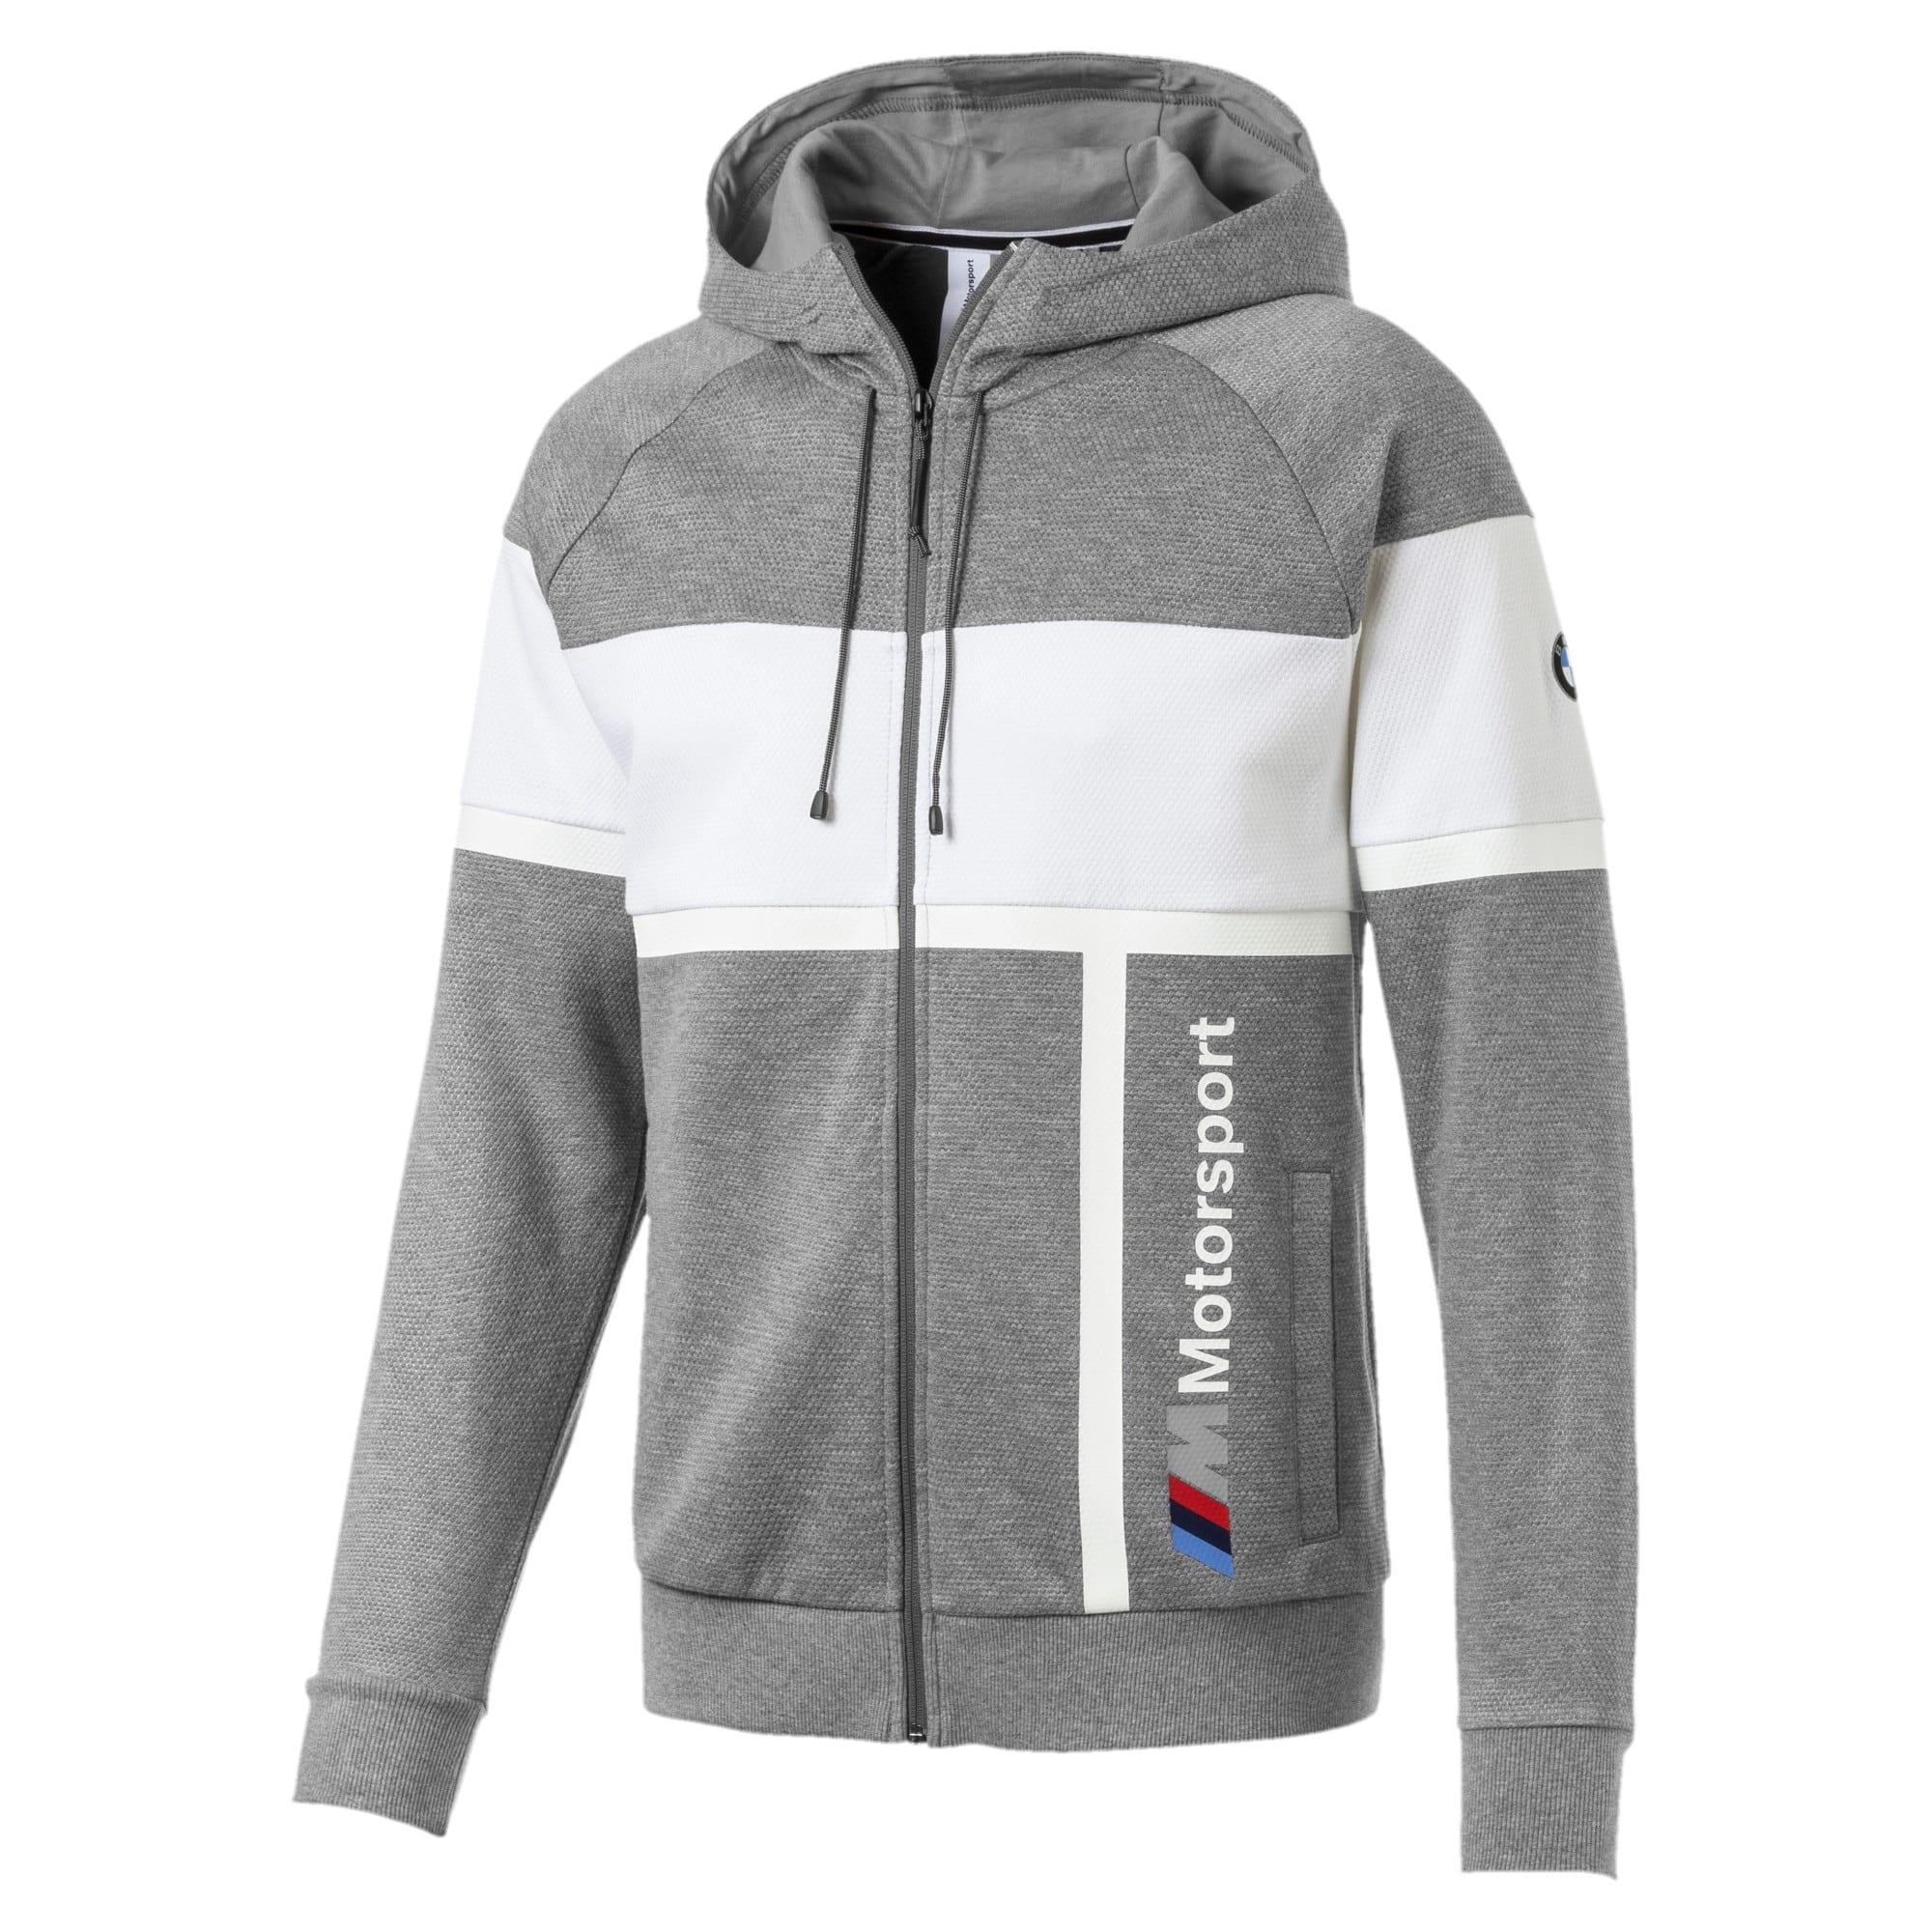 Thumbnail 1 of BMW M Motorsport Men's Hooded Sweat Jacket, Medium Gray Heather, medium